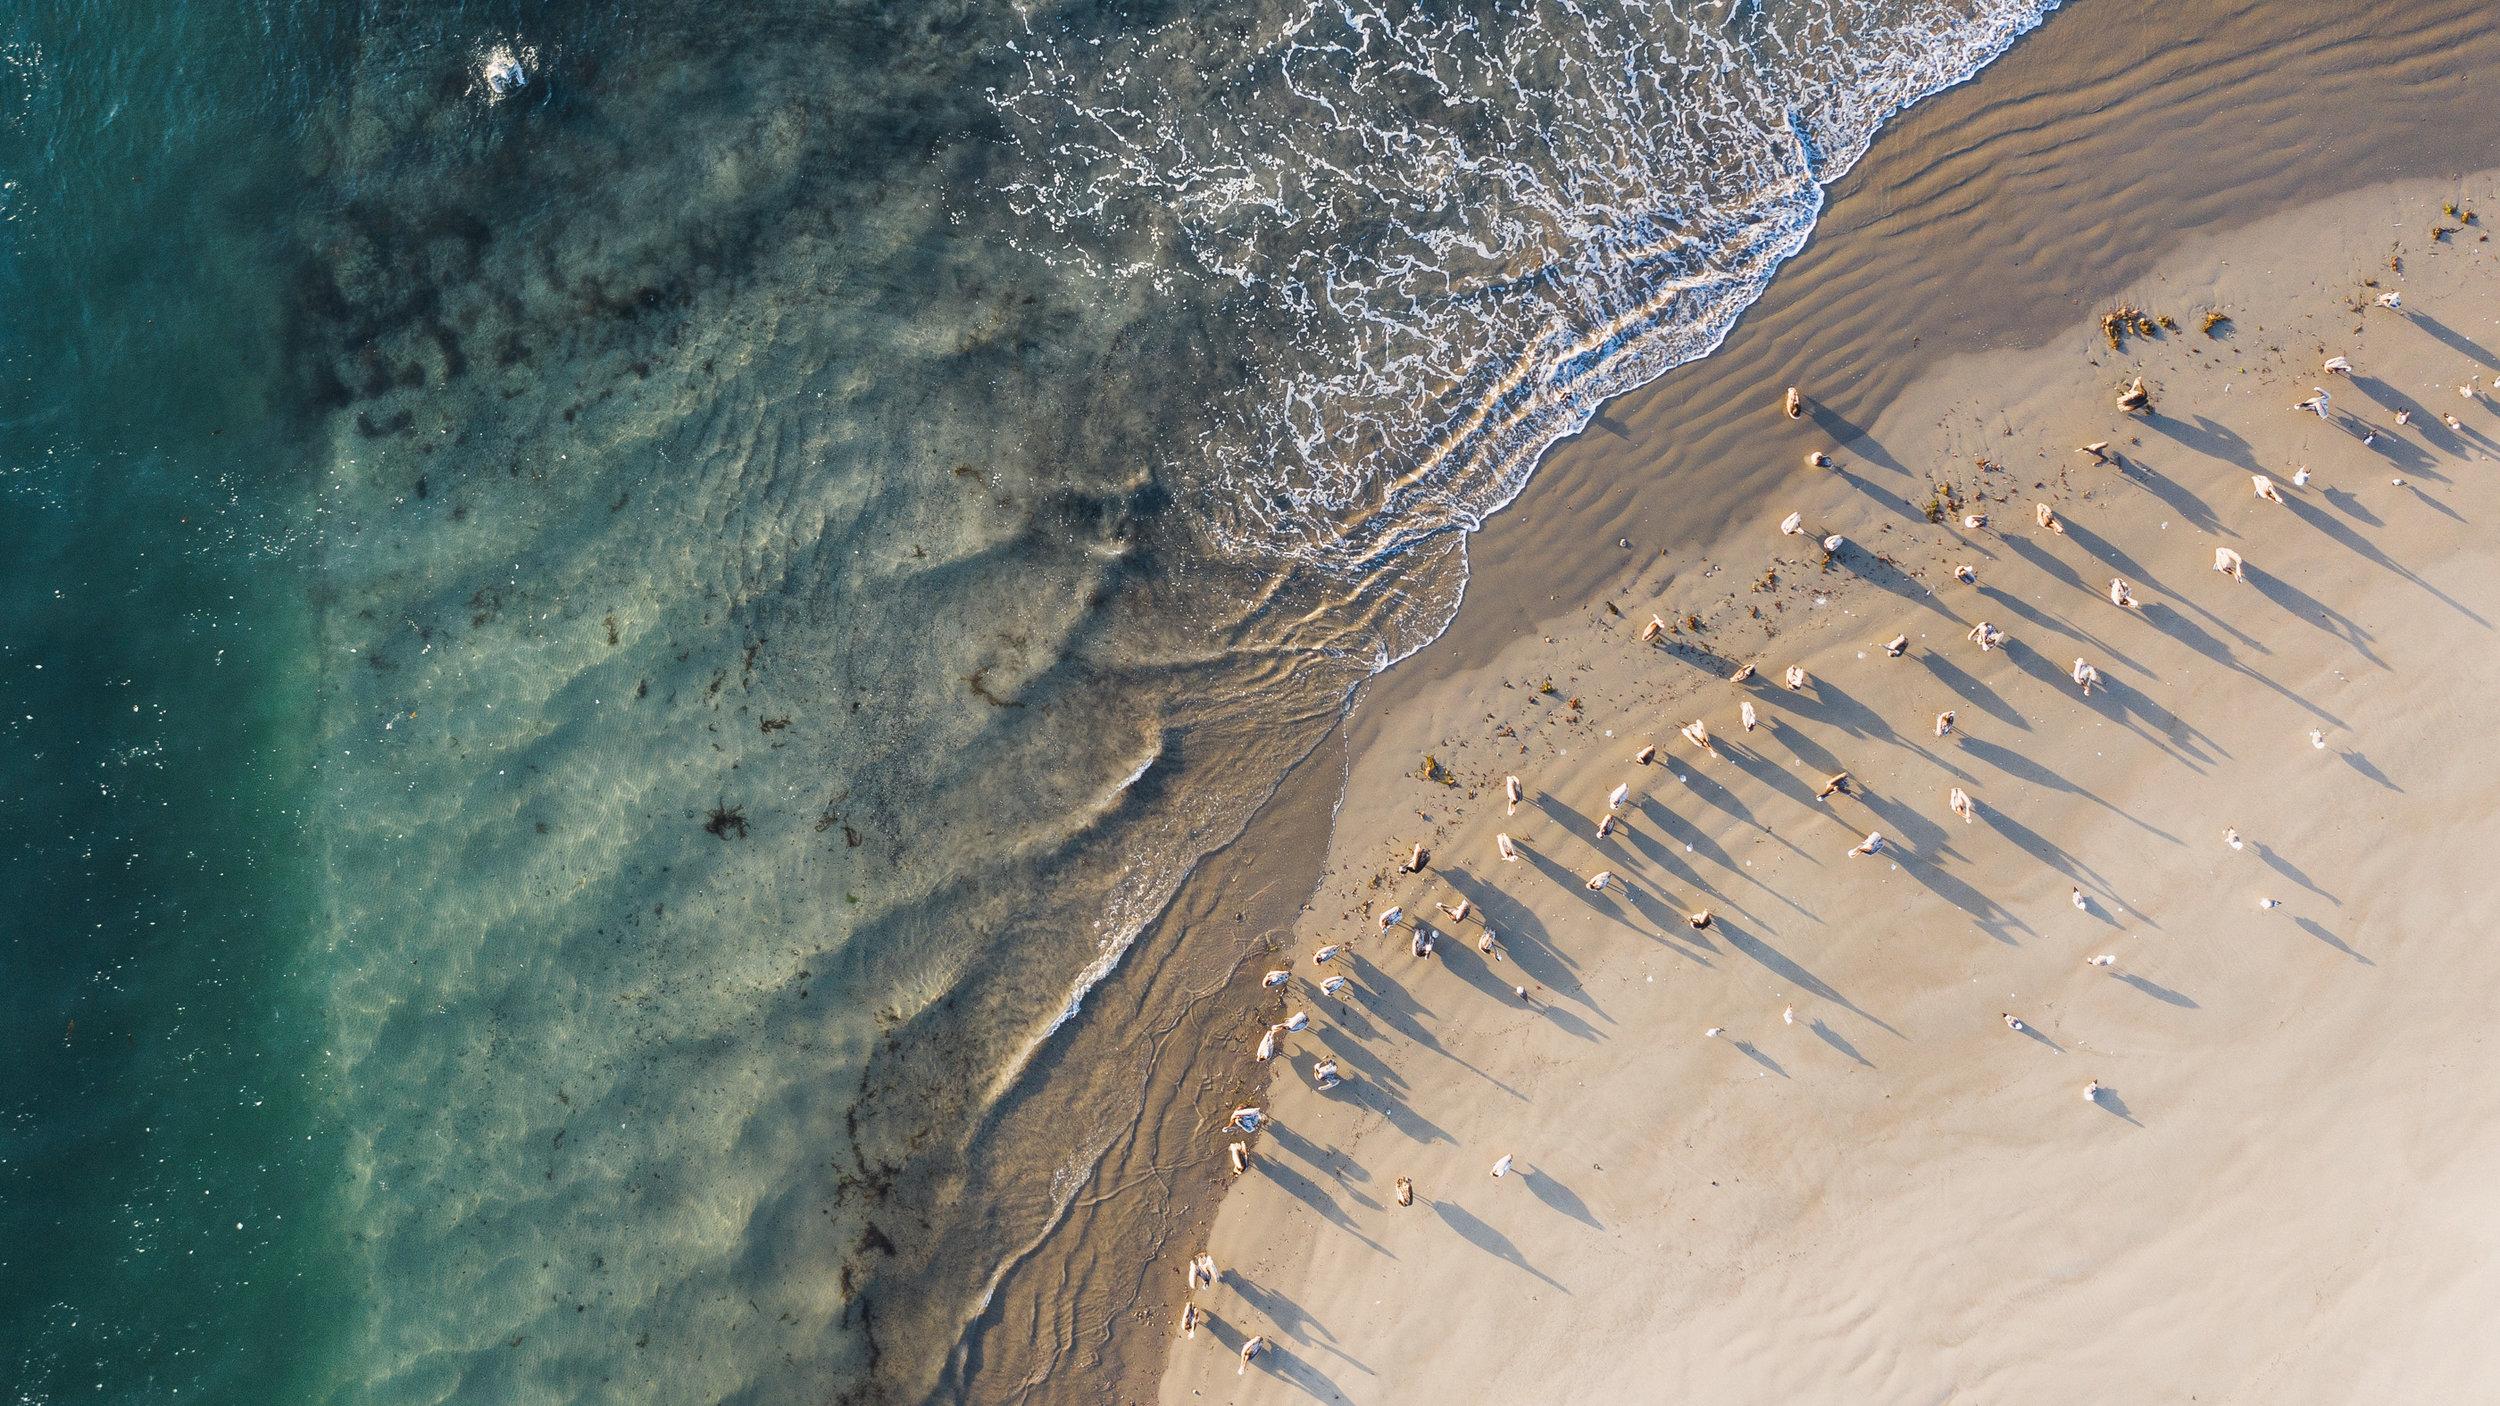 Los-Angeles-Aerial-Drone-Photographer-0660.jpg